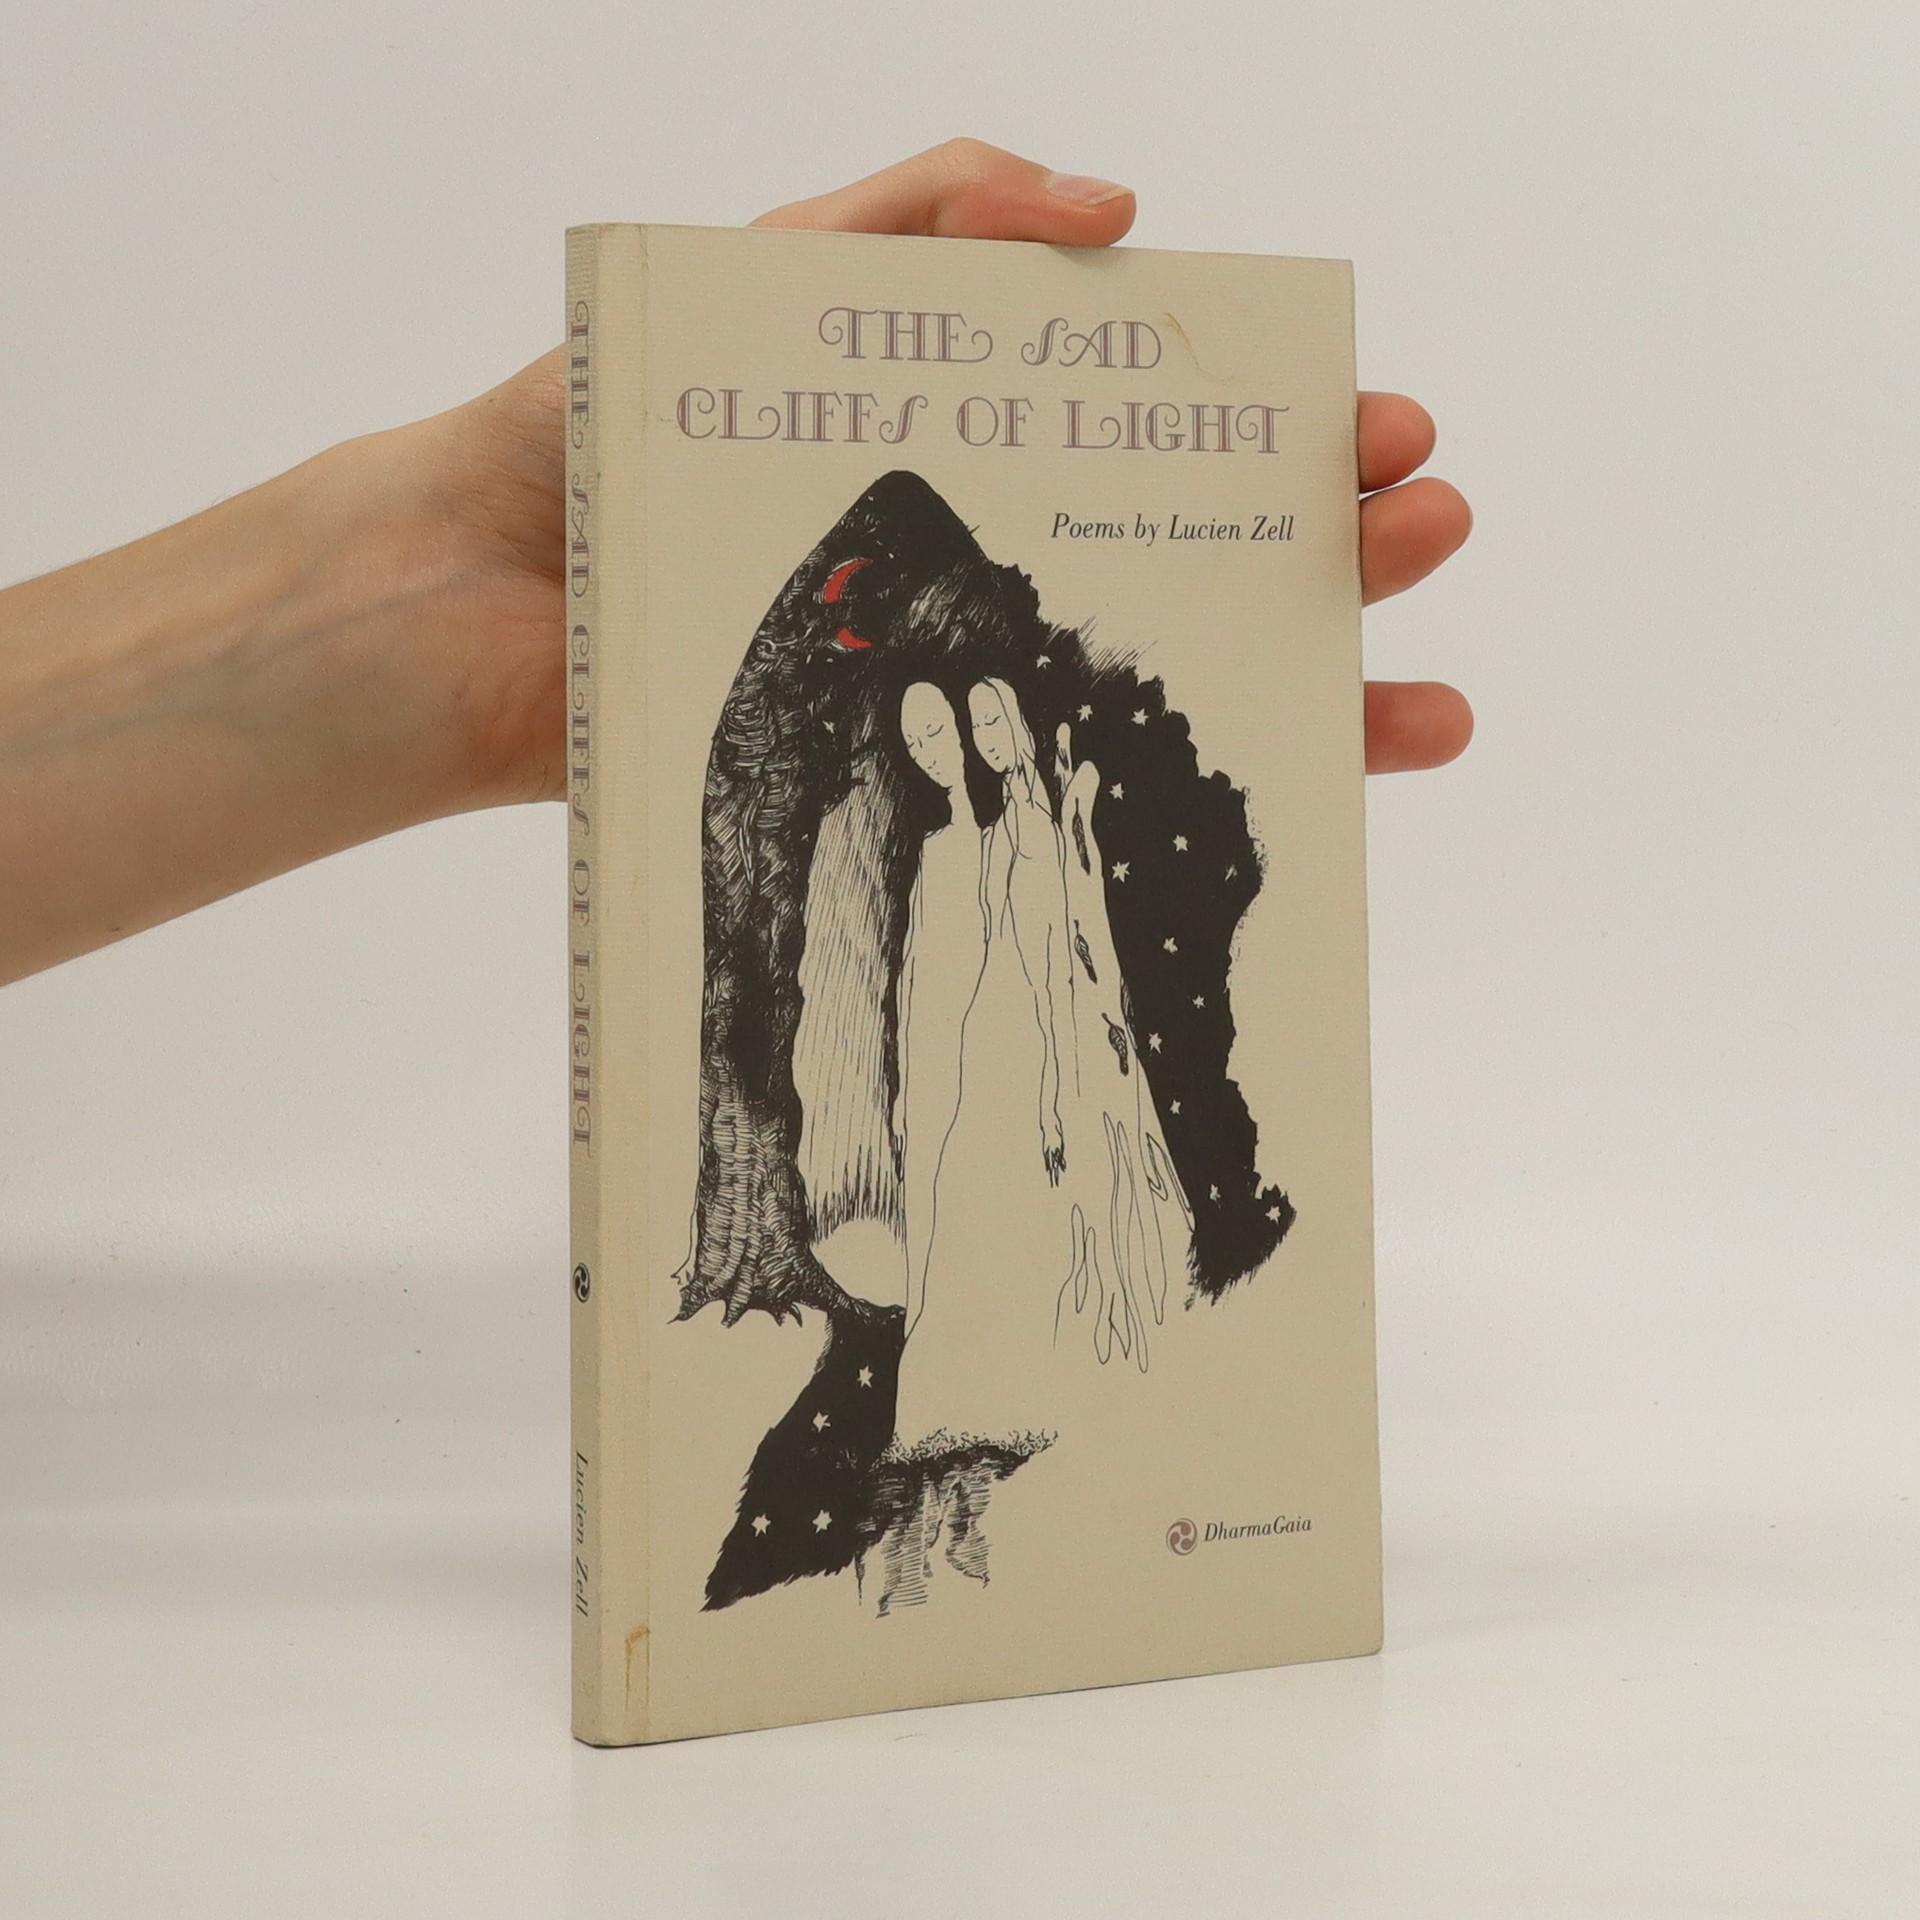 antikvární kniha The Sad Cliffs of Light, 1999